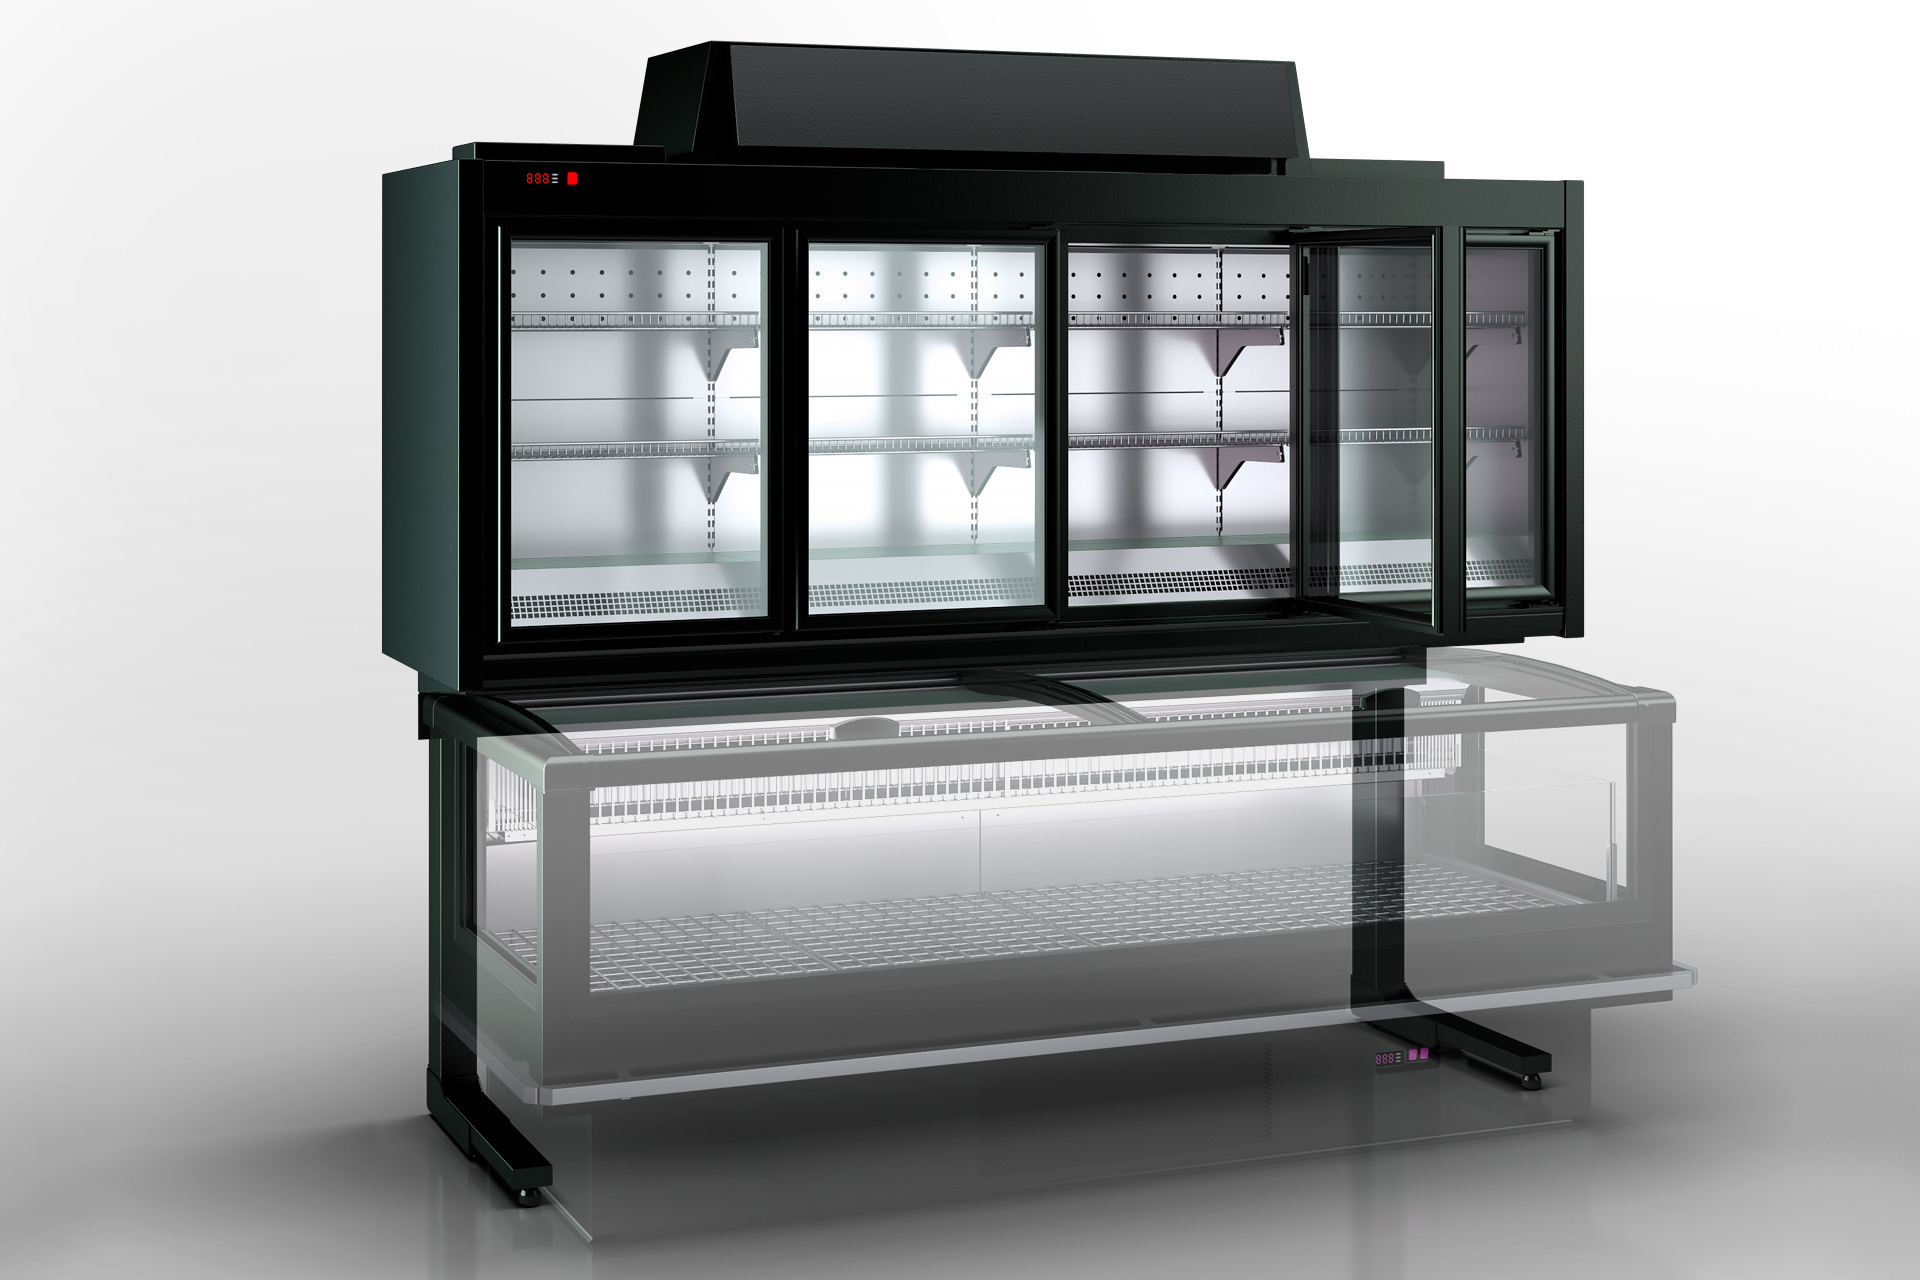 Frozen foods units Kansas VАV 076 HLT D 233-D800A-250